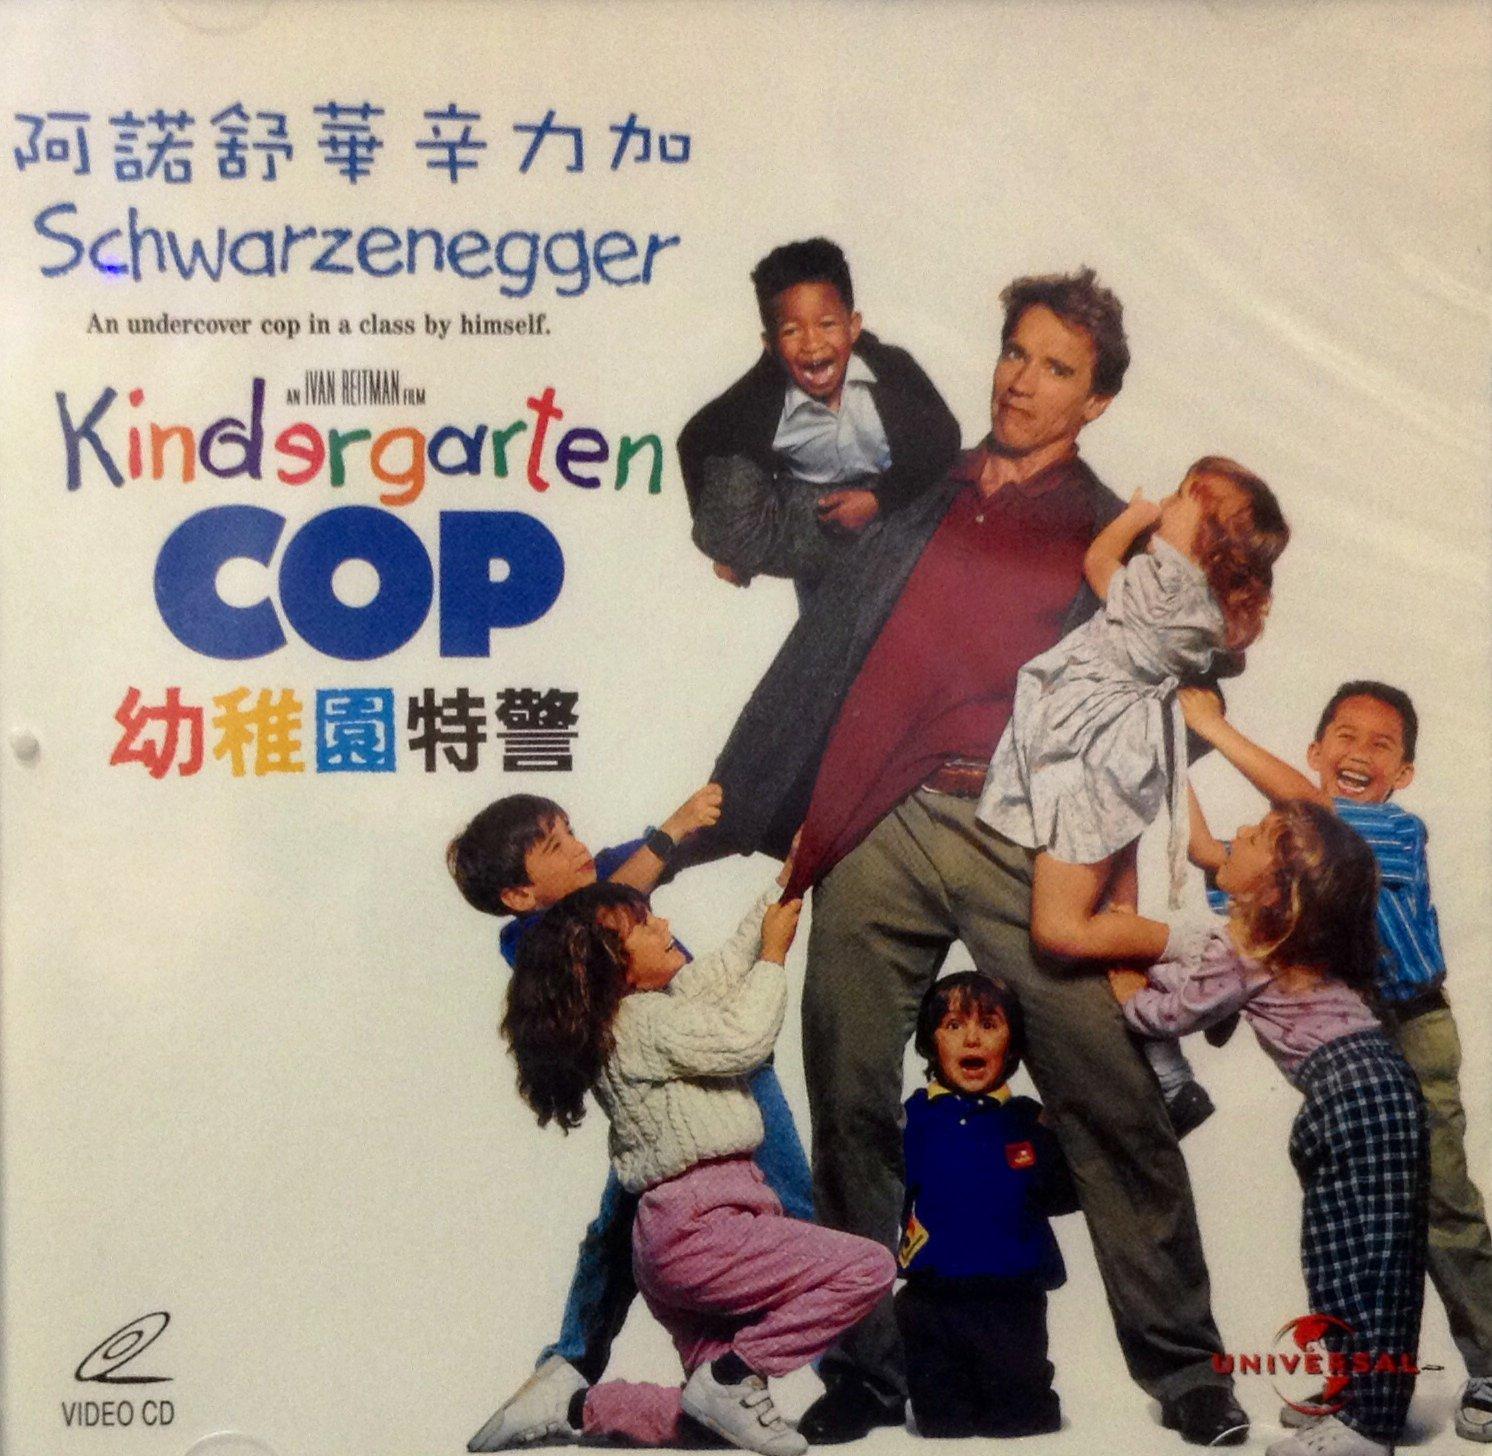 Amazon Com Kindergarten Cop 1990 By Era Version Vcd In English W Chinese Subtitle Imported From Hong Kong Arnold Schwarzenegger Penelope Ann Miller Pamela Reed Ivan Reitman Movies Tv